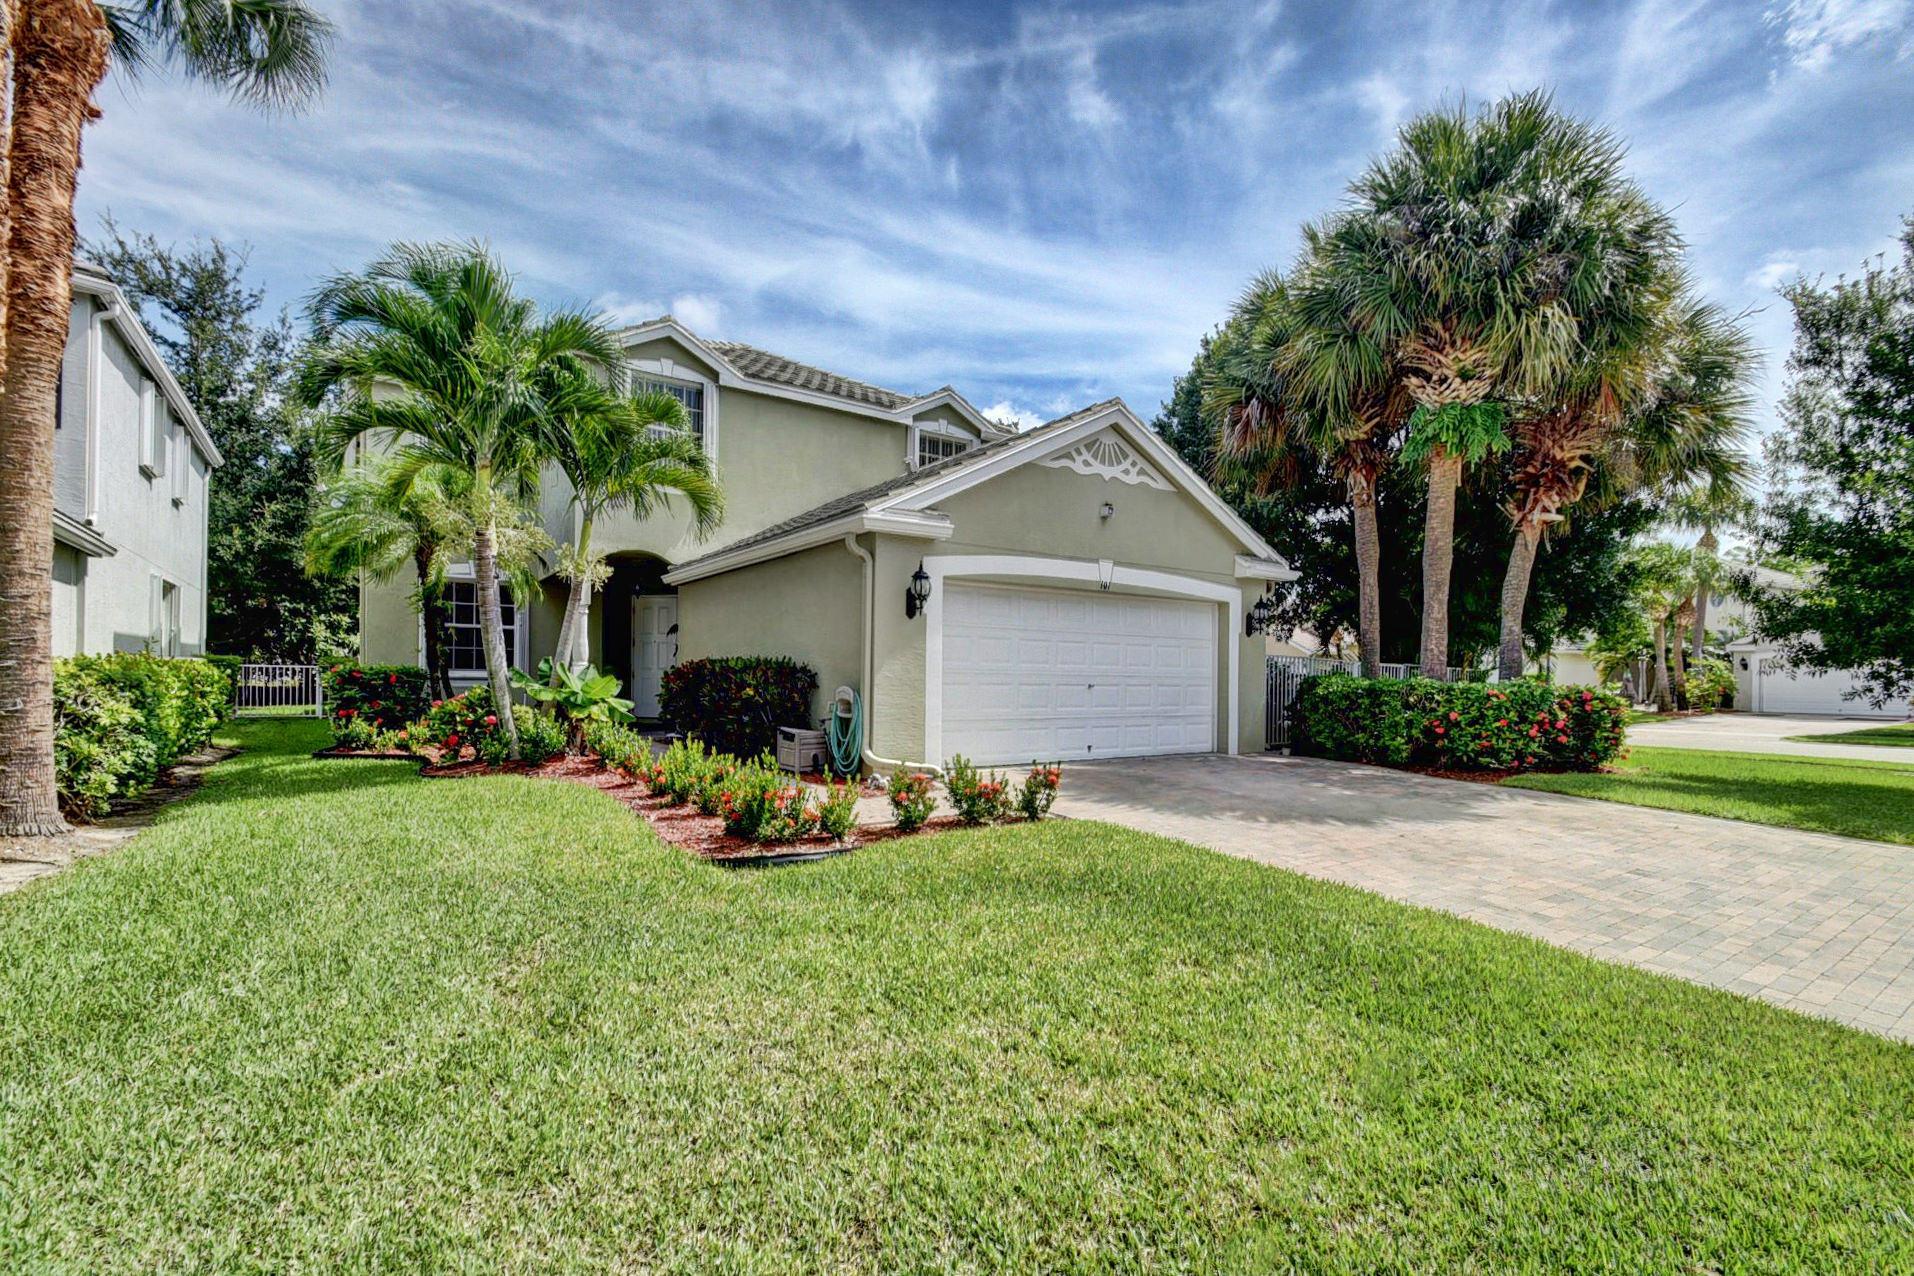 Photo of 101 Newberry Lane, Royal Palm Beach, FL 33414